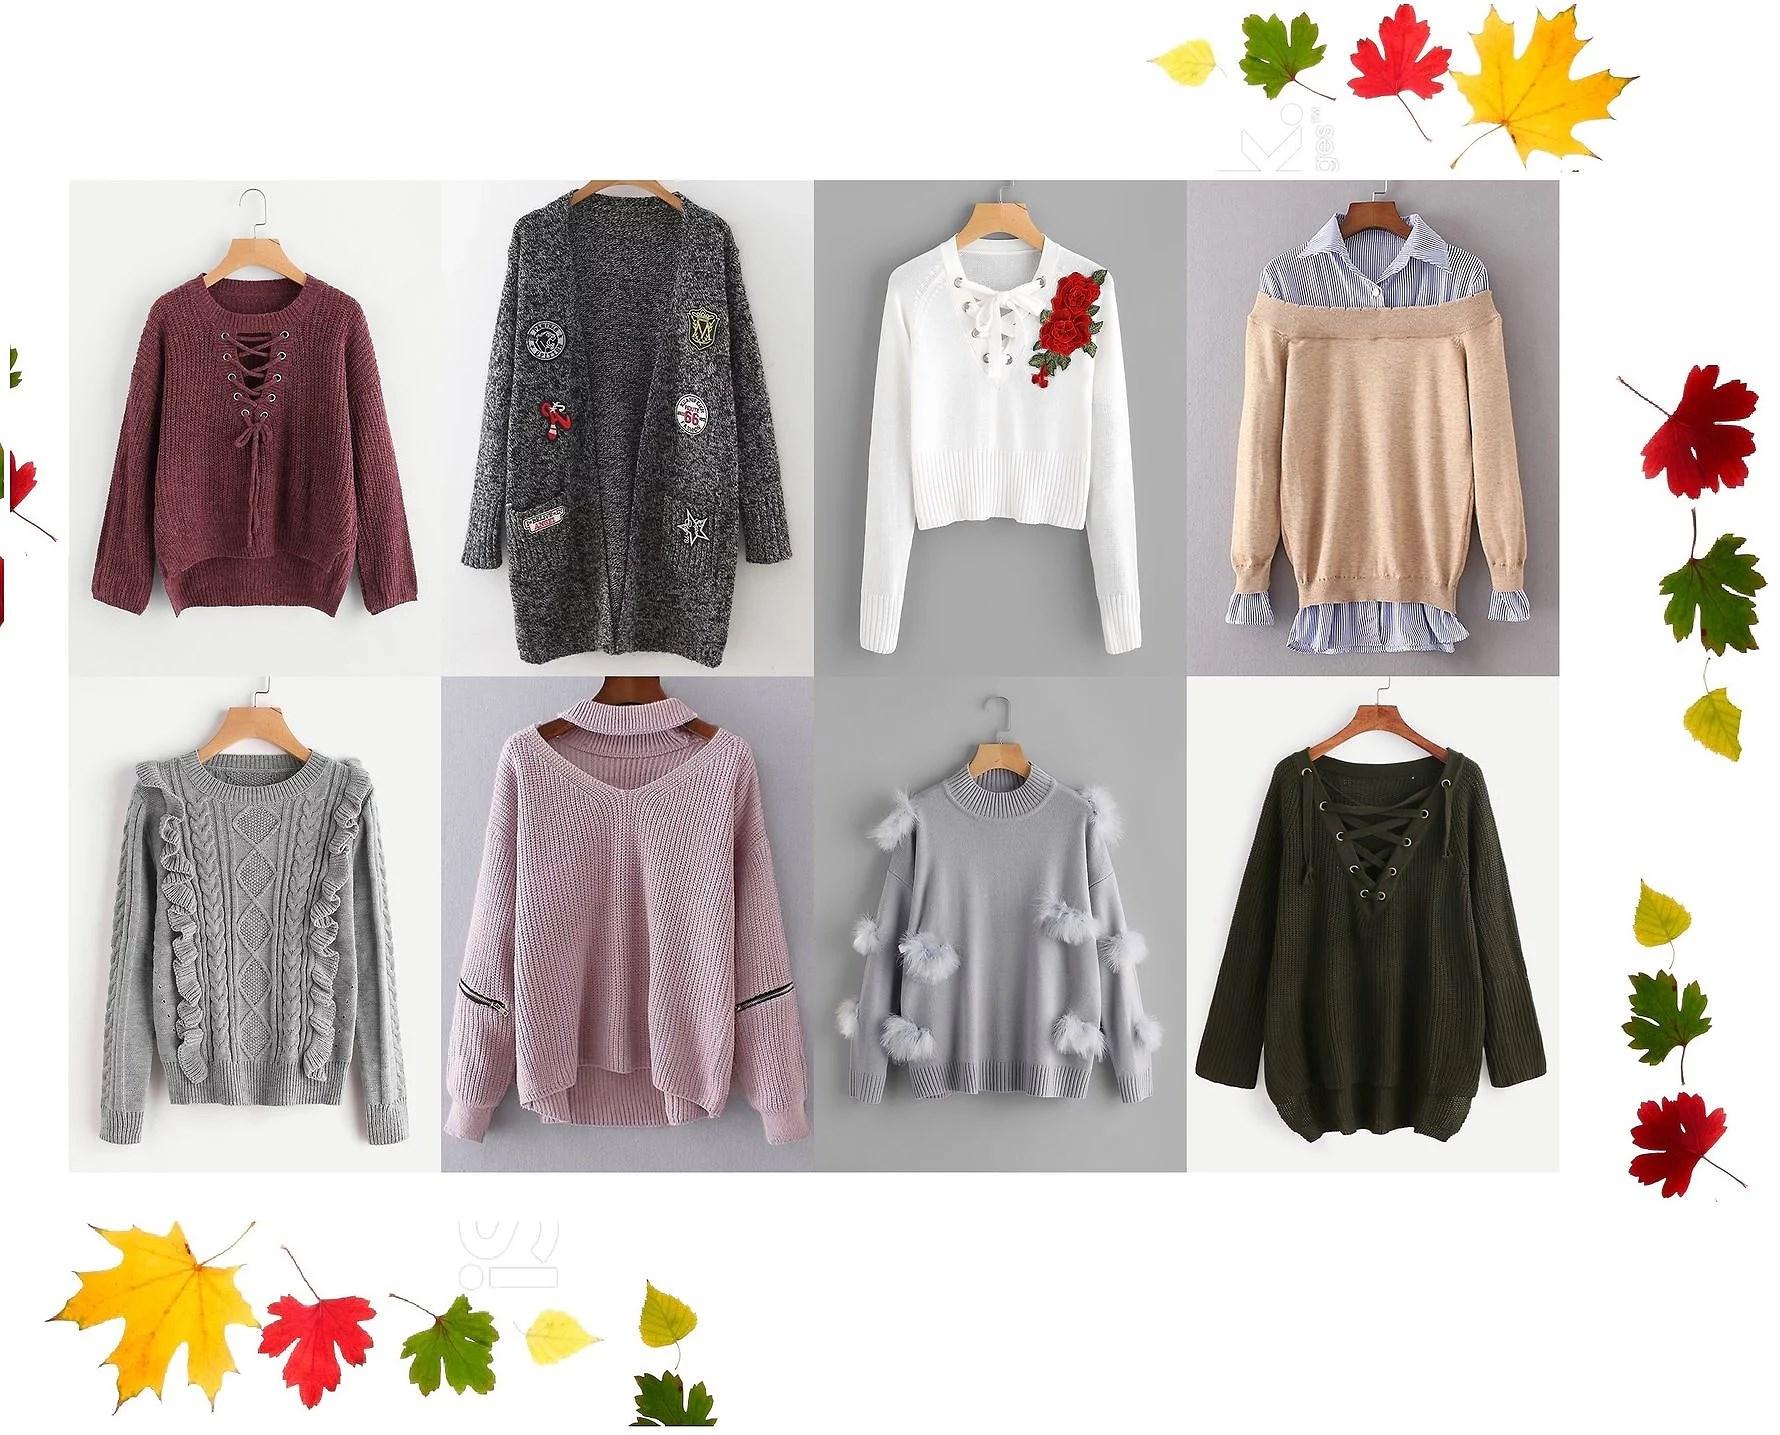 Autumn sweaters 2017 -  Sweterki na jesień, sezon 2017!